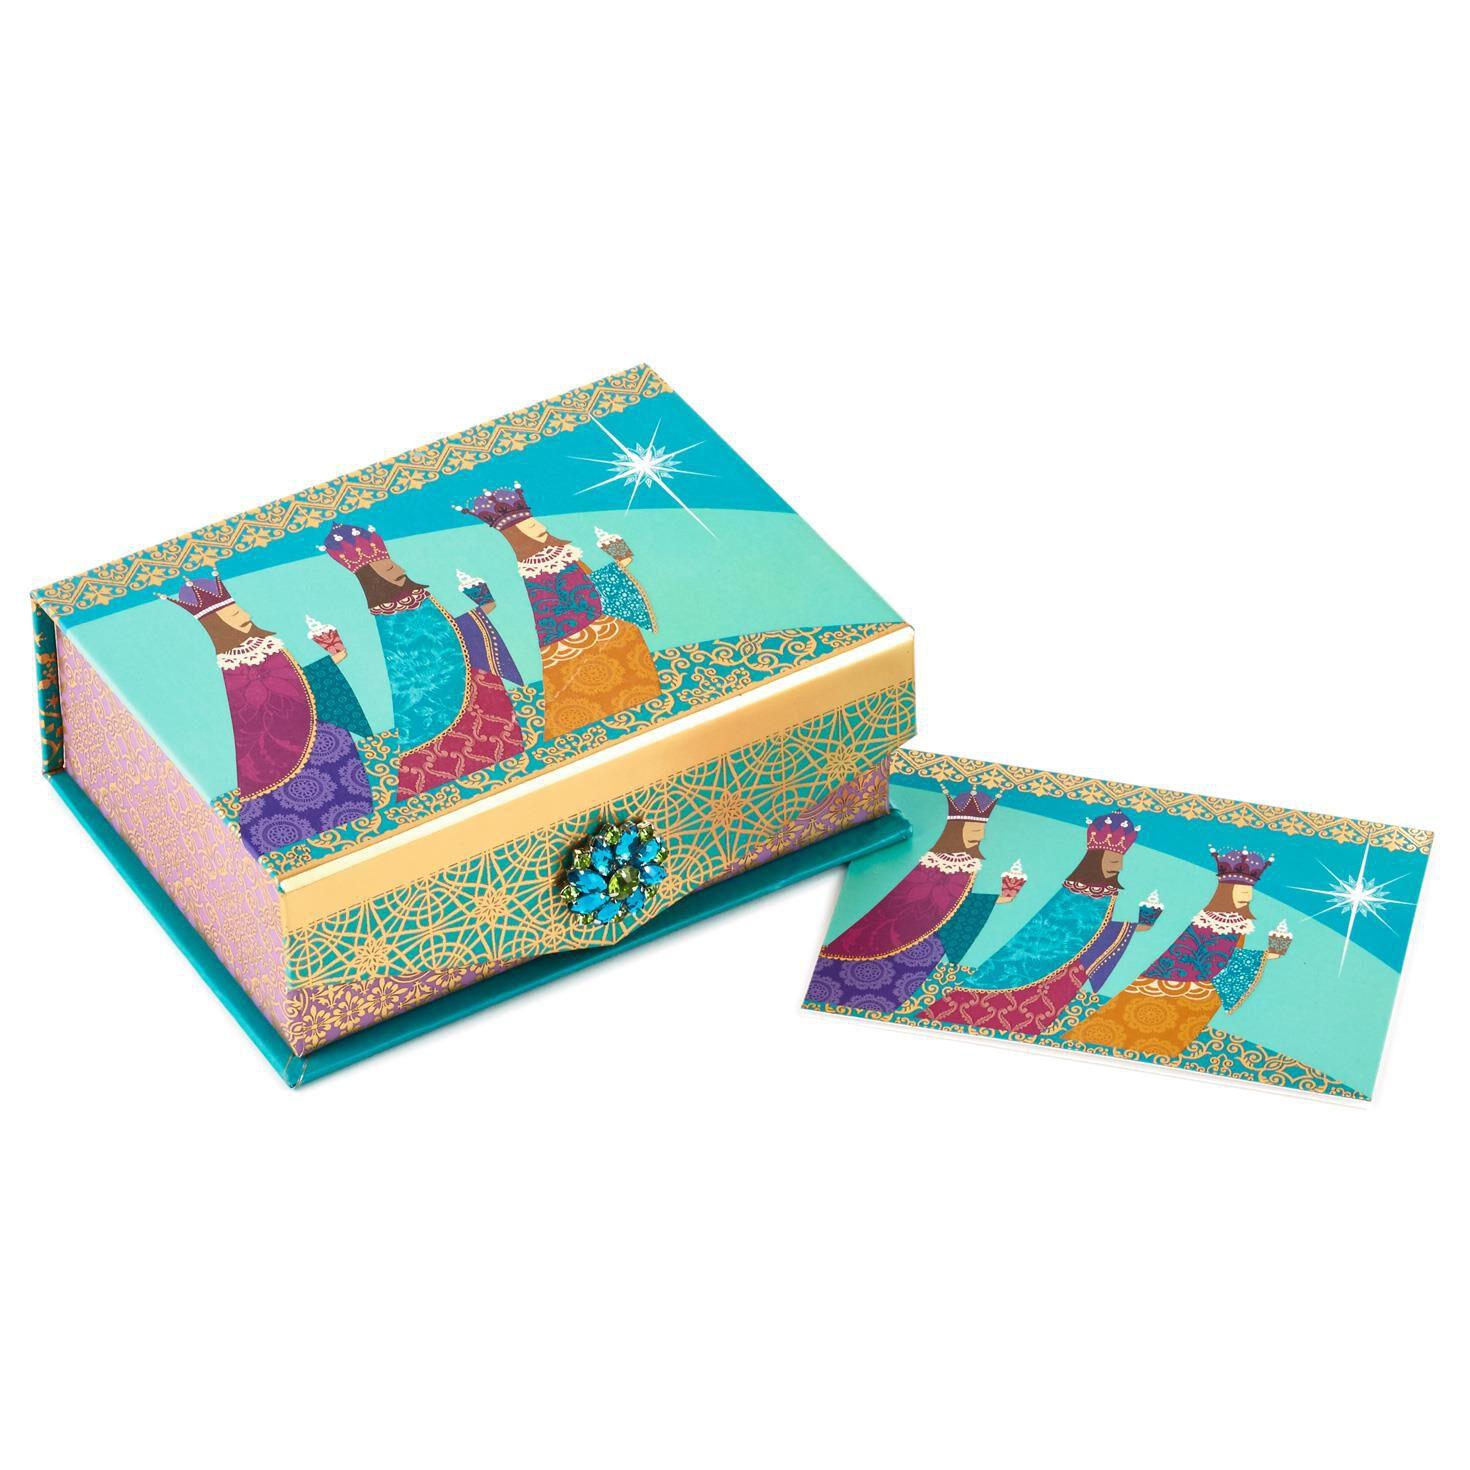 We Three Kings Christmas Cards, Box of 16 - Boxed Cards - Hallmark